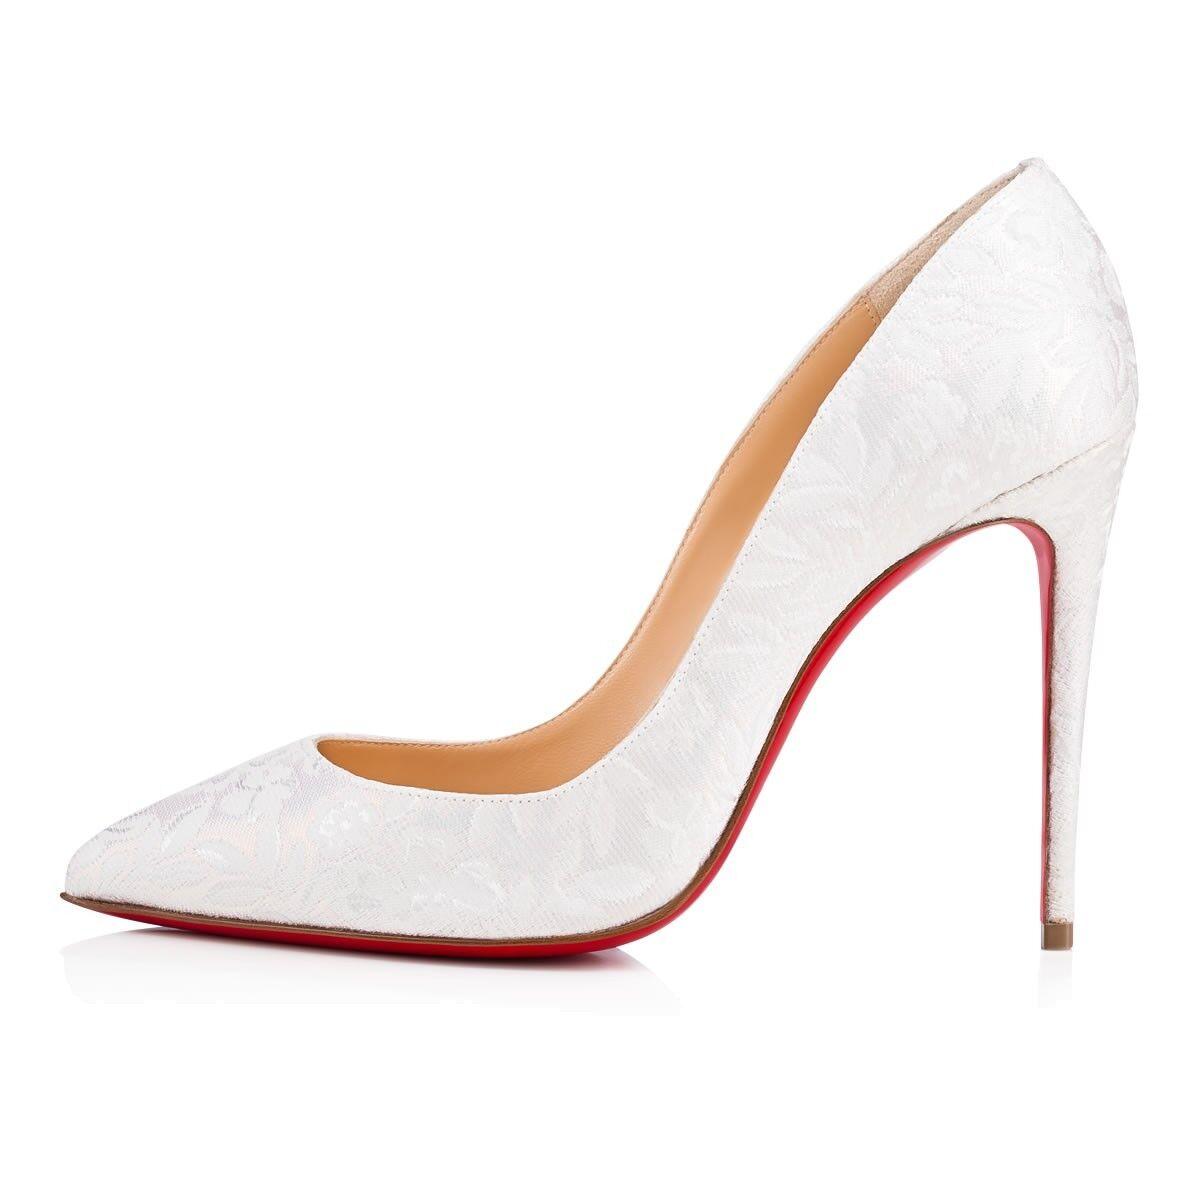 NIB Christian Louboutin Pigalle Follies 100 Weiß Weiß Weiß Latte Wedding Heel Pump 38.5 b9e576